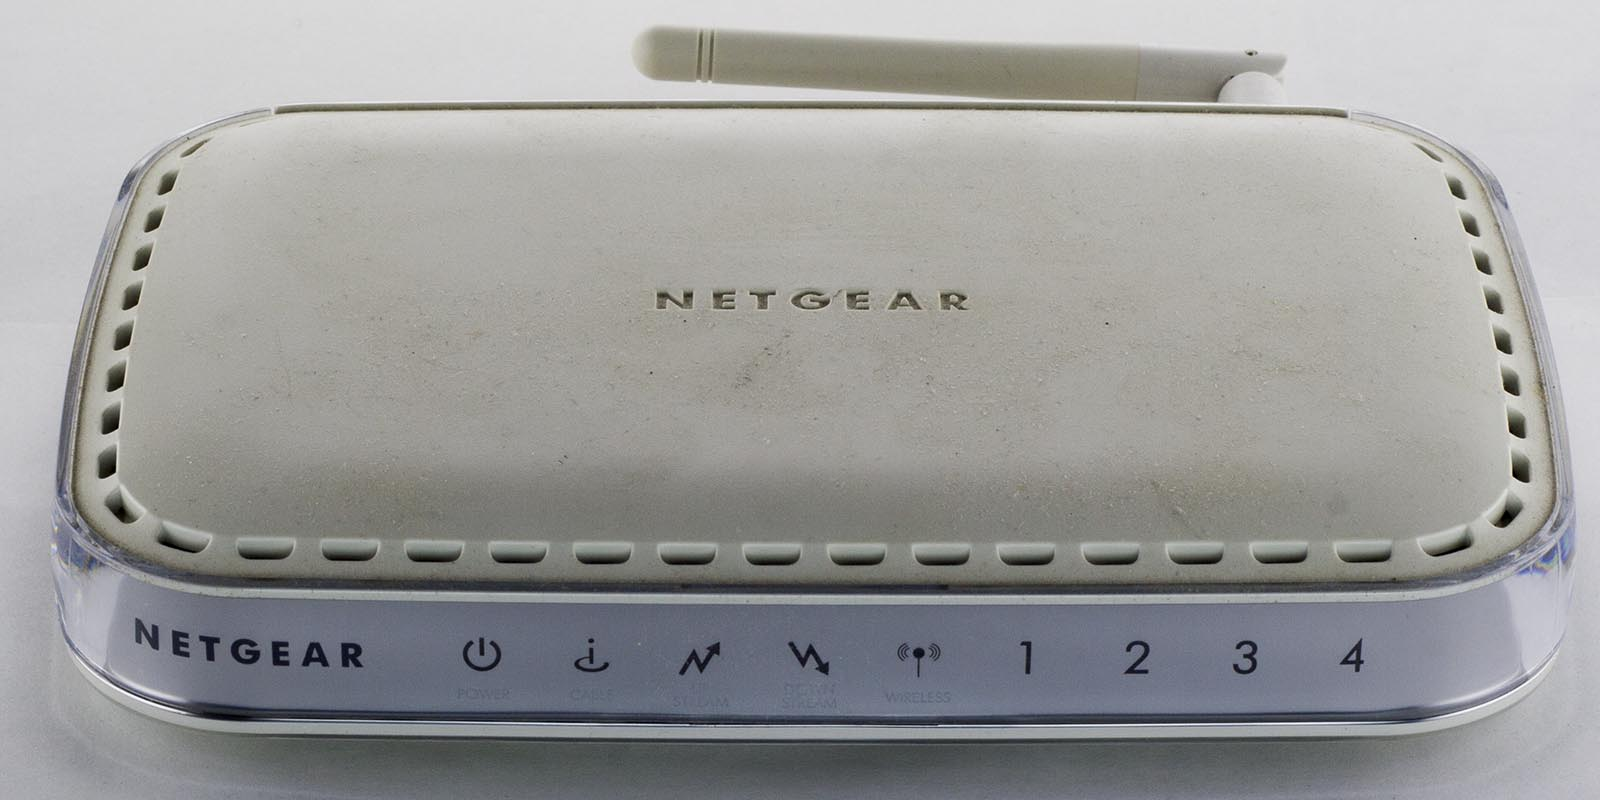 NETGEAR CG814WG DRIVERS FOR WINDOWS DOWNLOAD